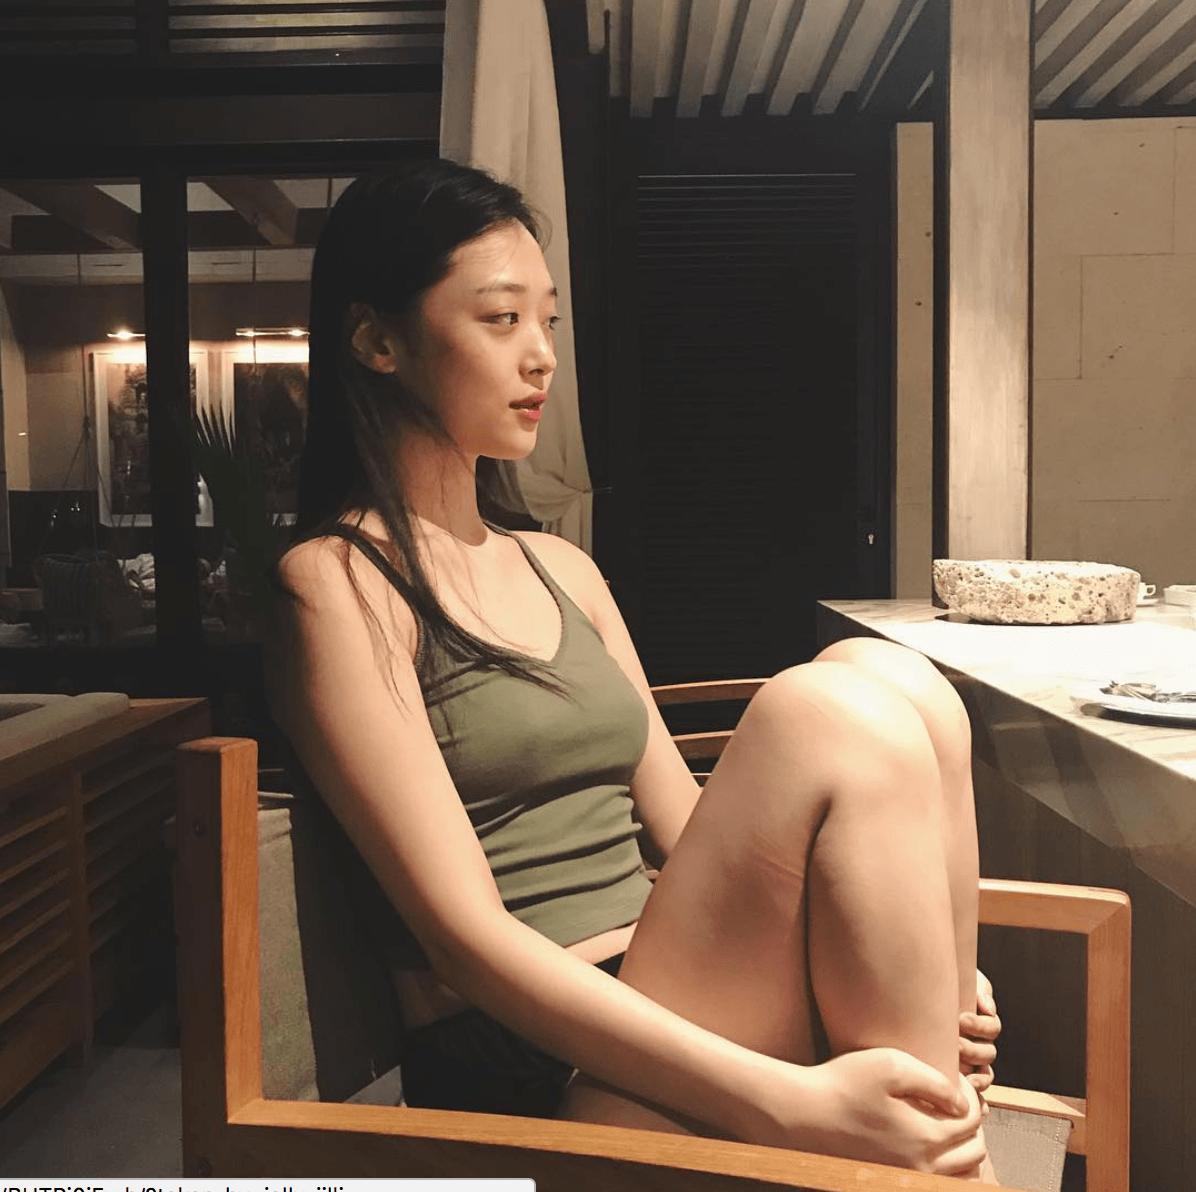 दक्षिण कोरियाकी 'नो ब्रा'अभियन्ता पप गायक सुली मृत फेला